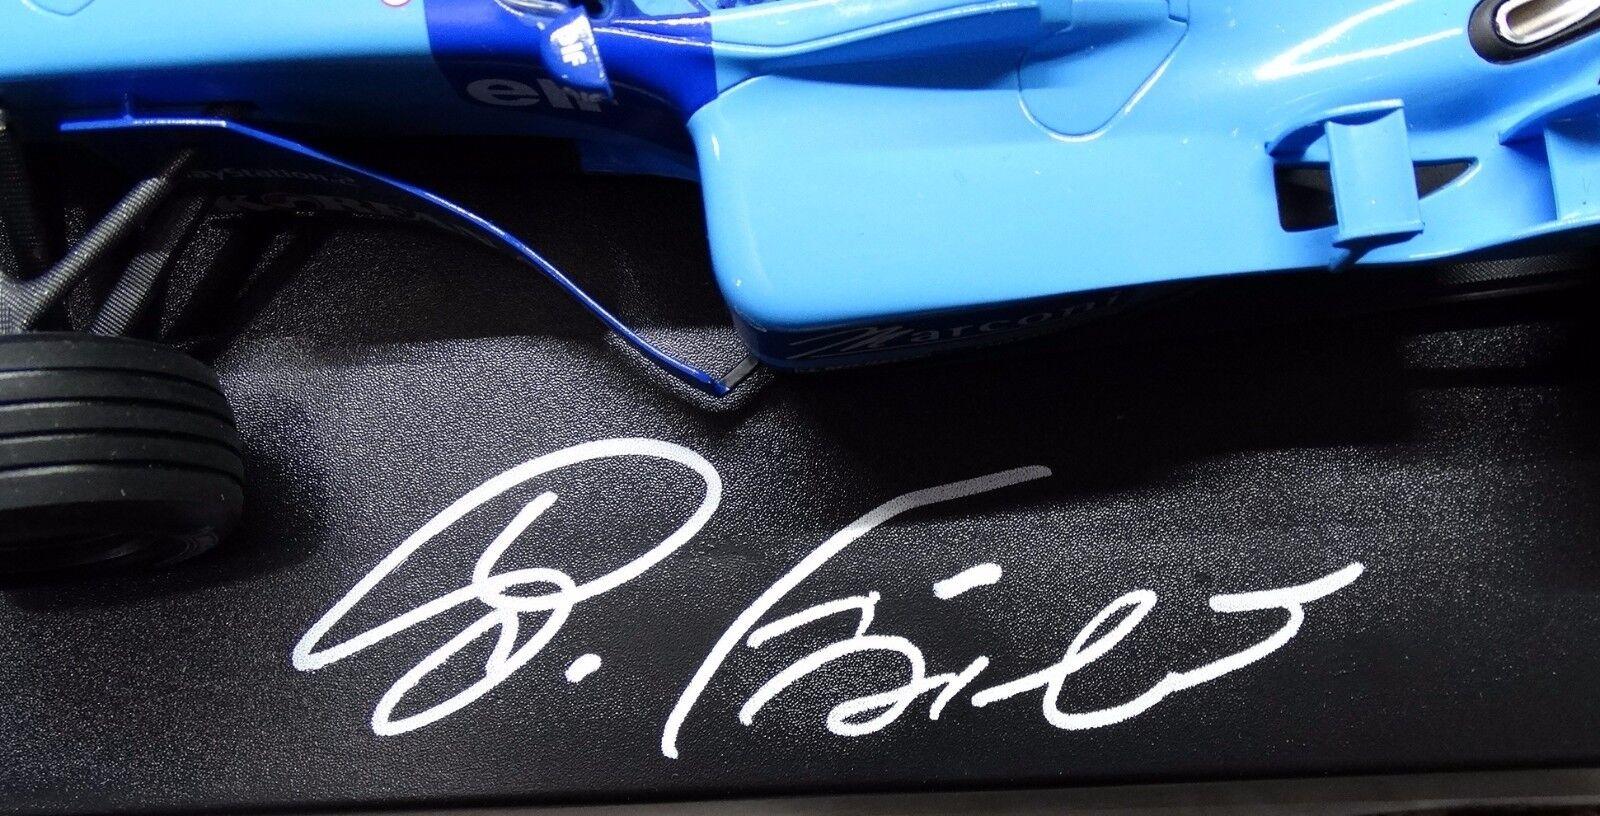 BENETTON RENAULT B201 Gianautolo FISICHELLA F1 signed signed signed autografato 1 18 NO SPARK dae9bd